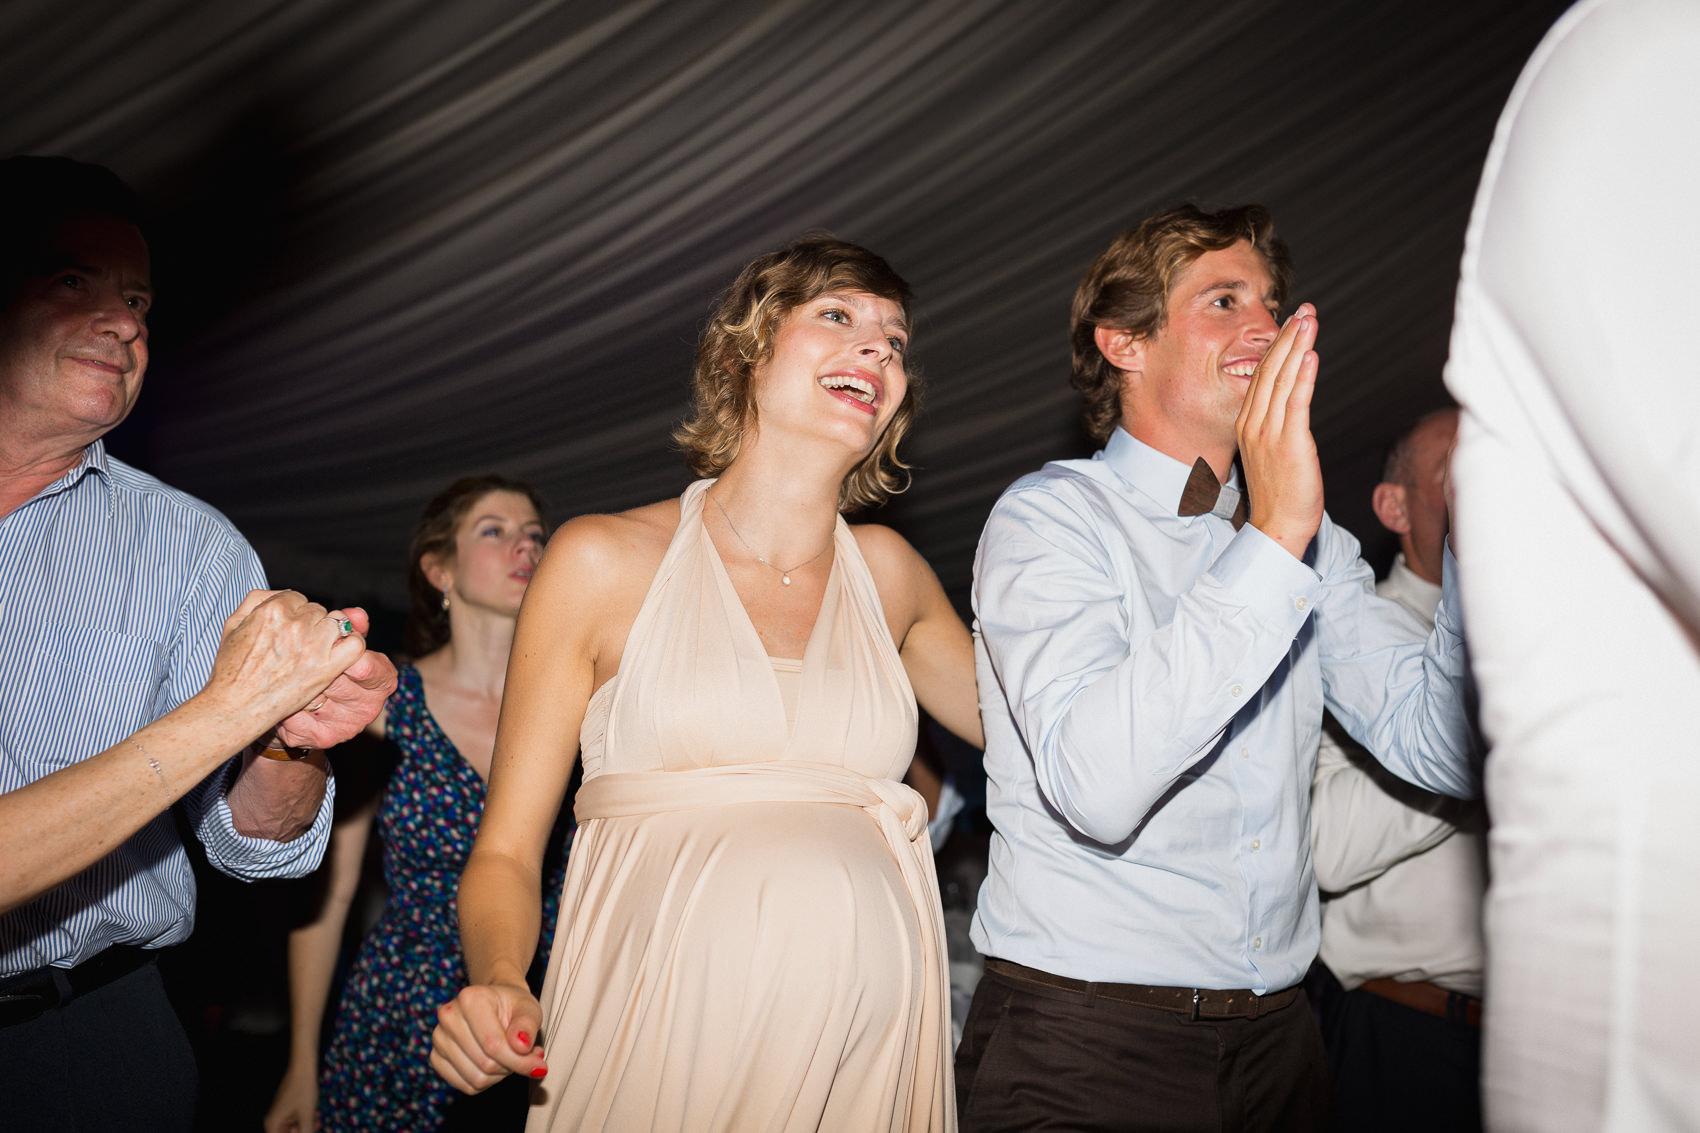 mariage-charlotte-et-joel-trendzphotography-121